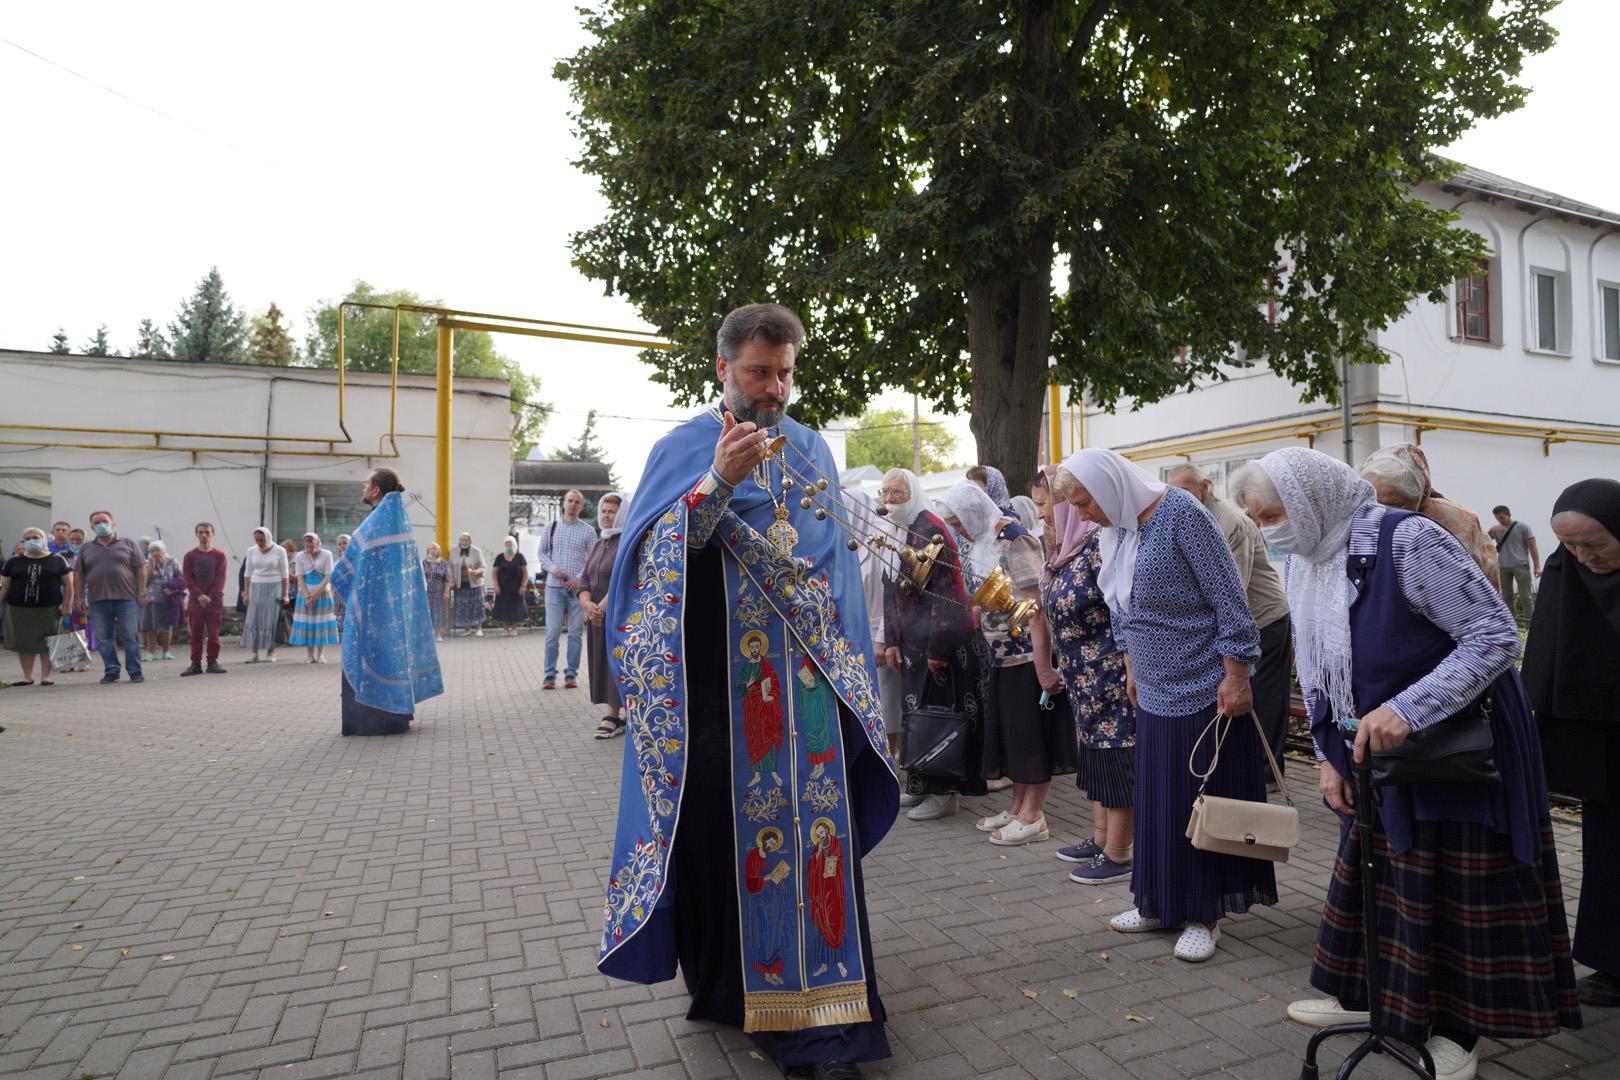 http://monuspen.ru/photoreports/eb9de00e1f5615849ea00b127bfcb98t.jpg